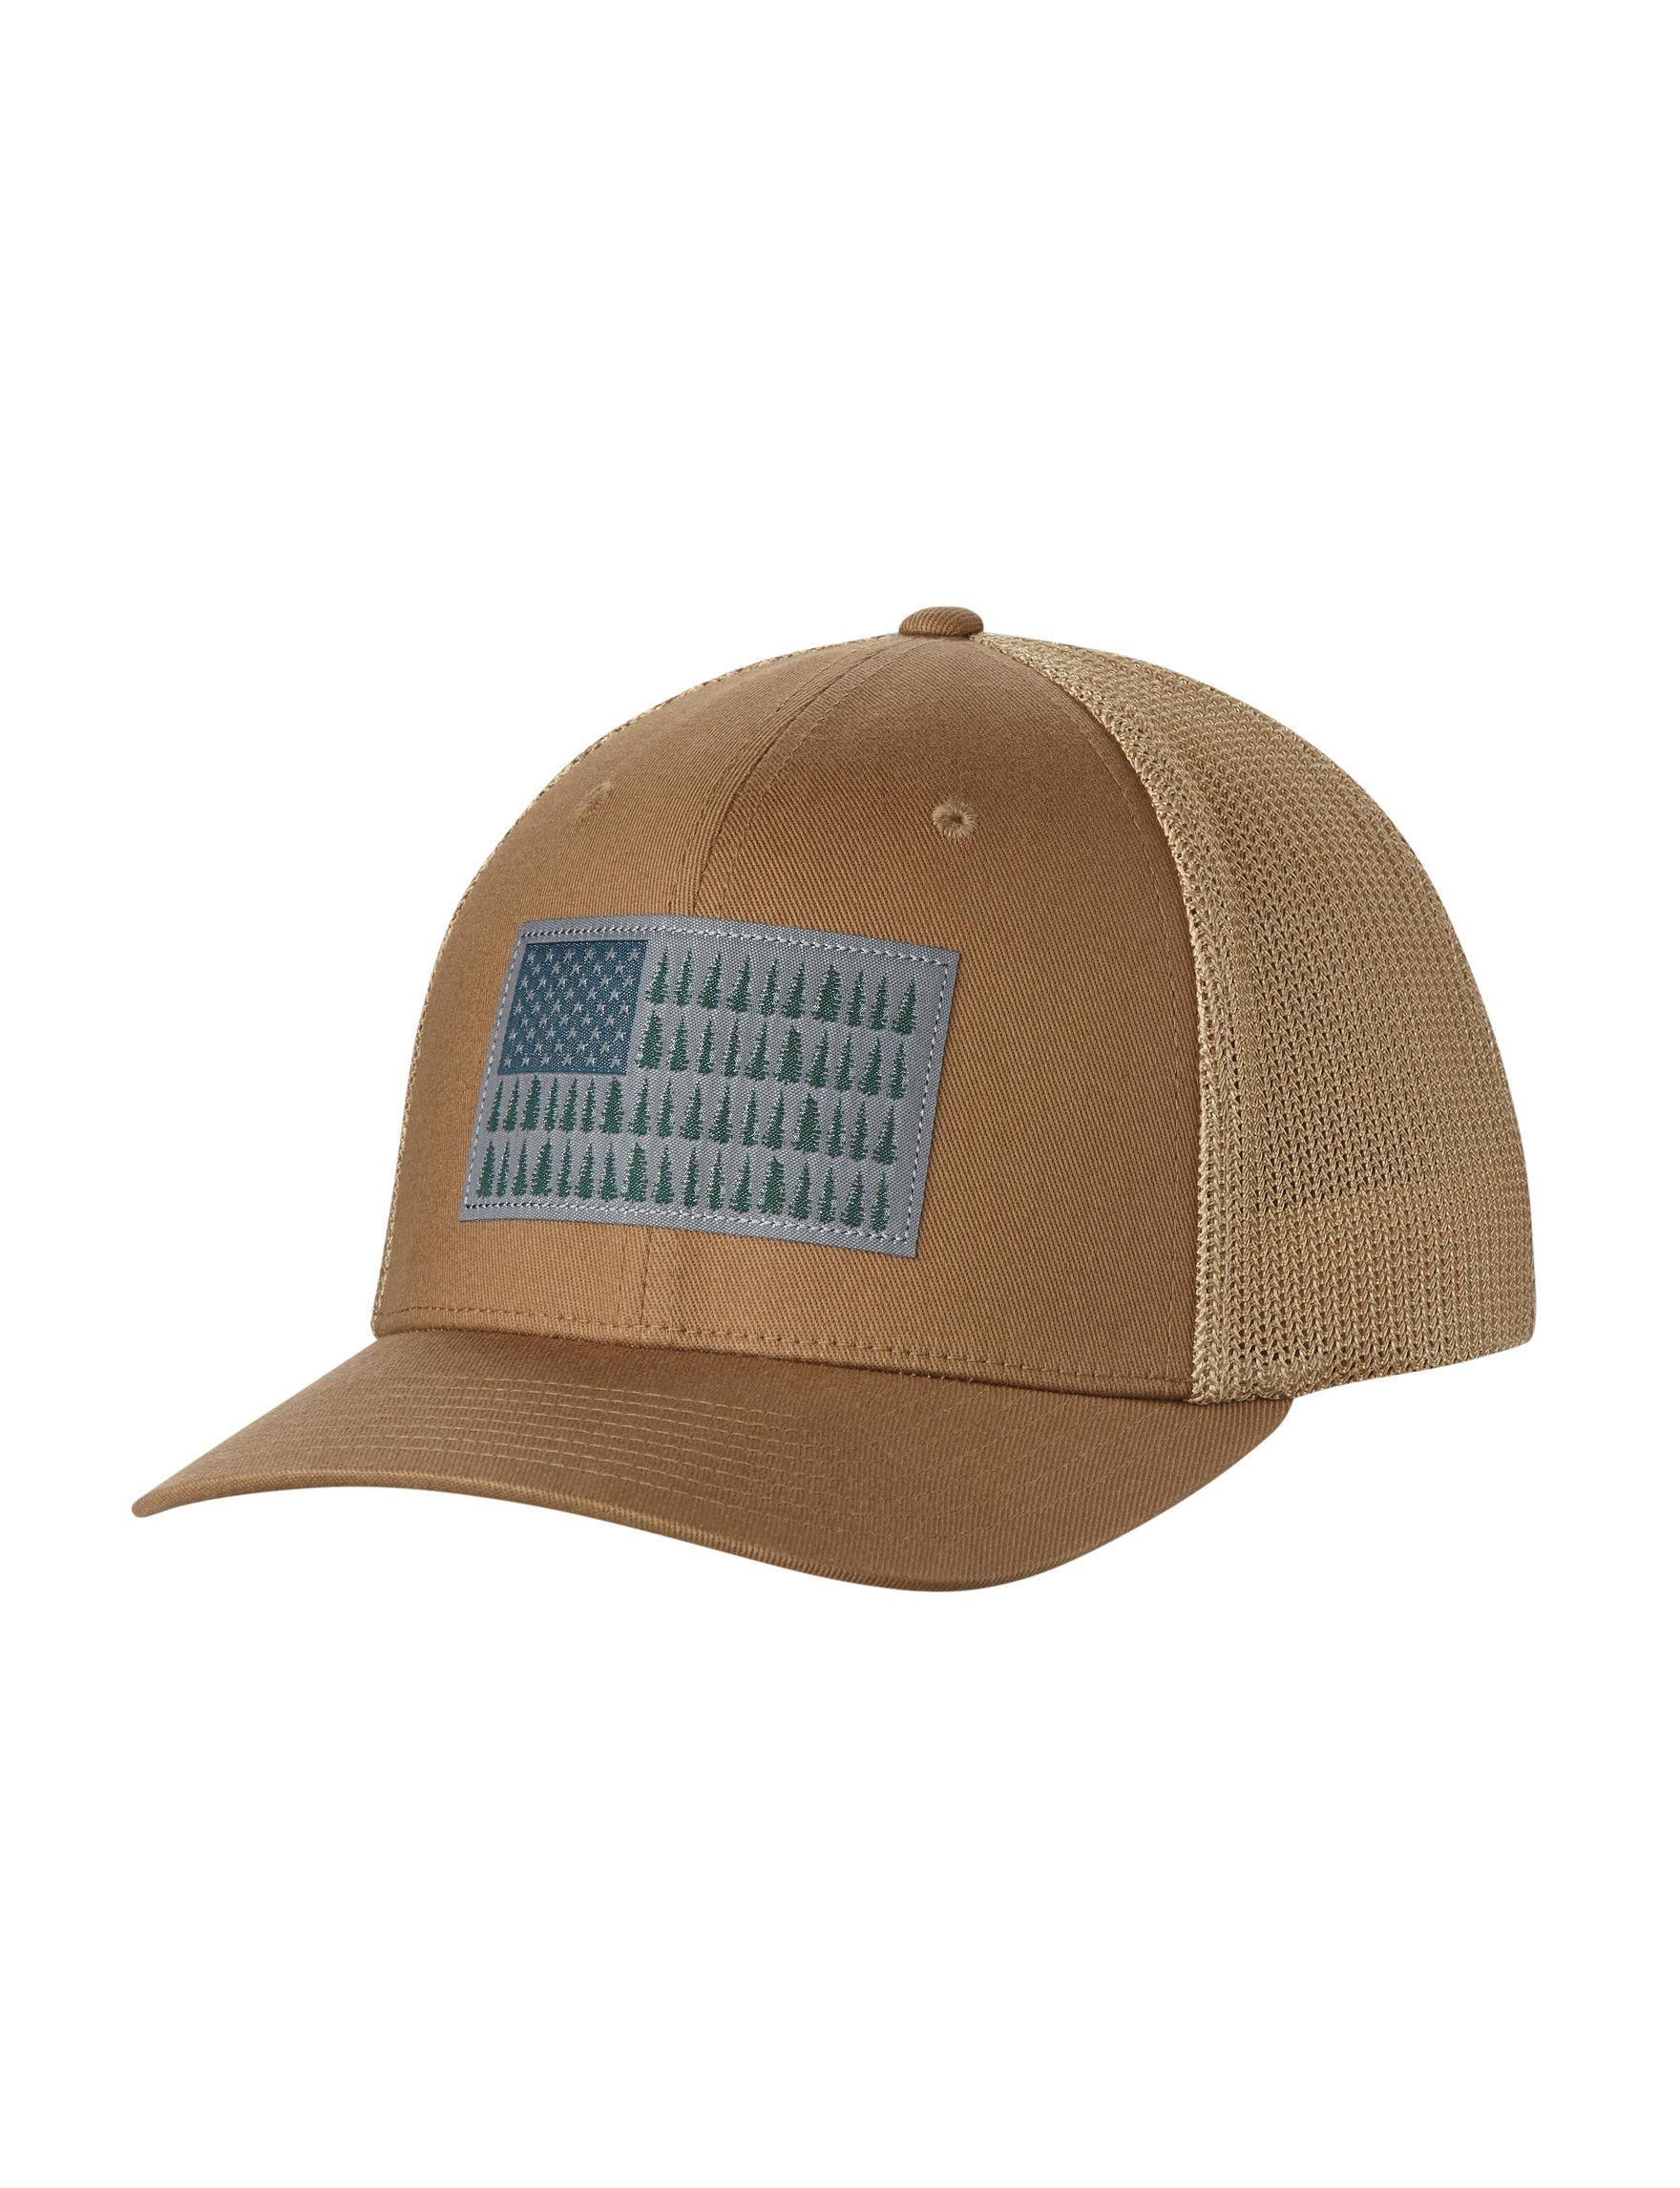 Columbia Tan Hats & Headwear Baseball Caps